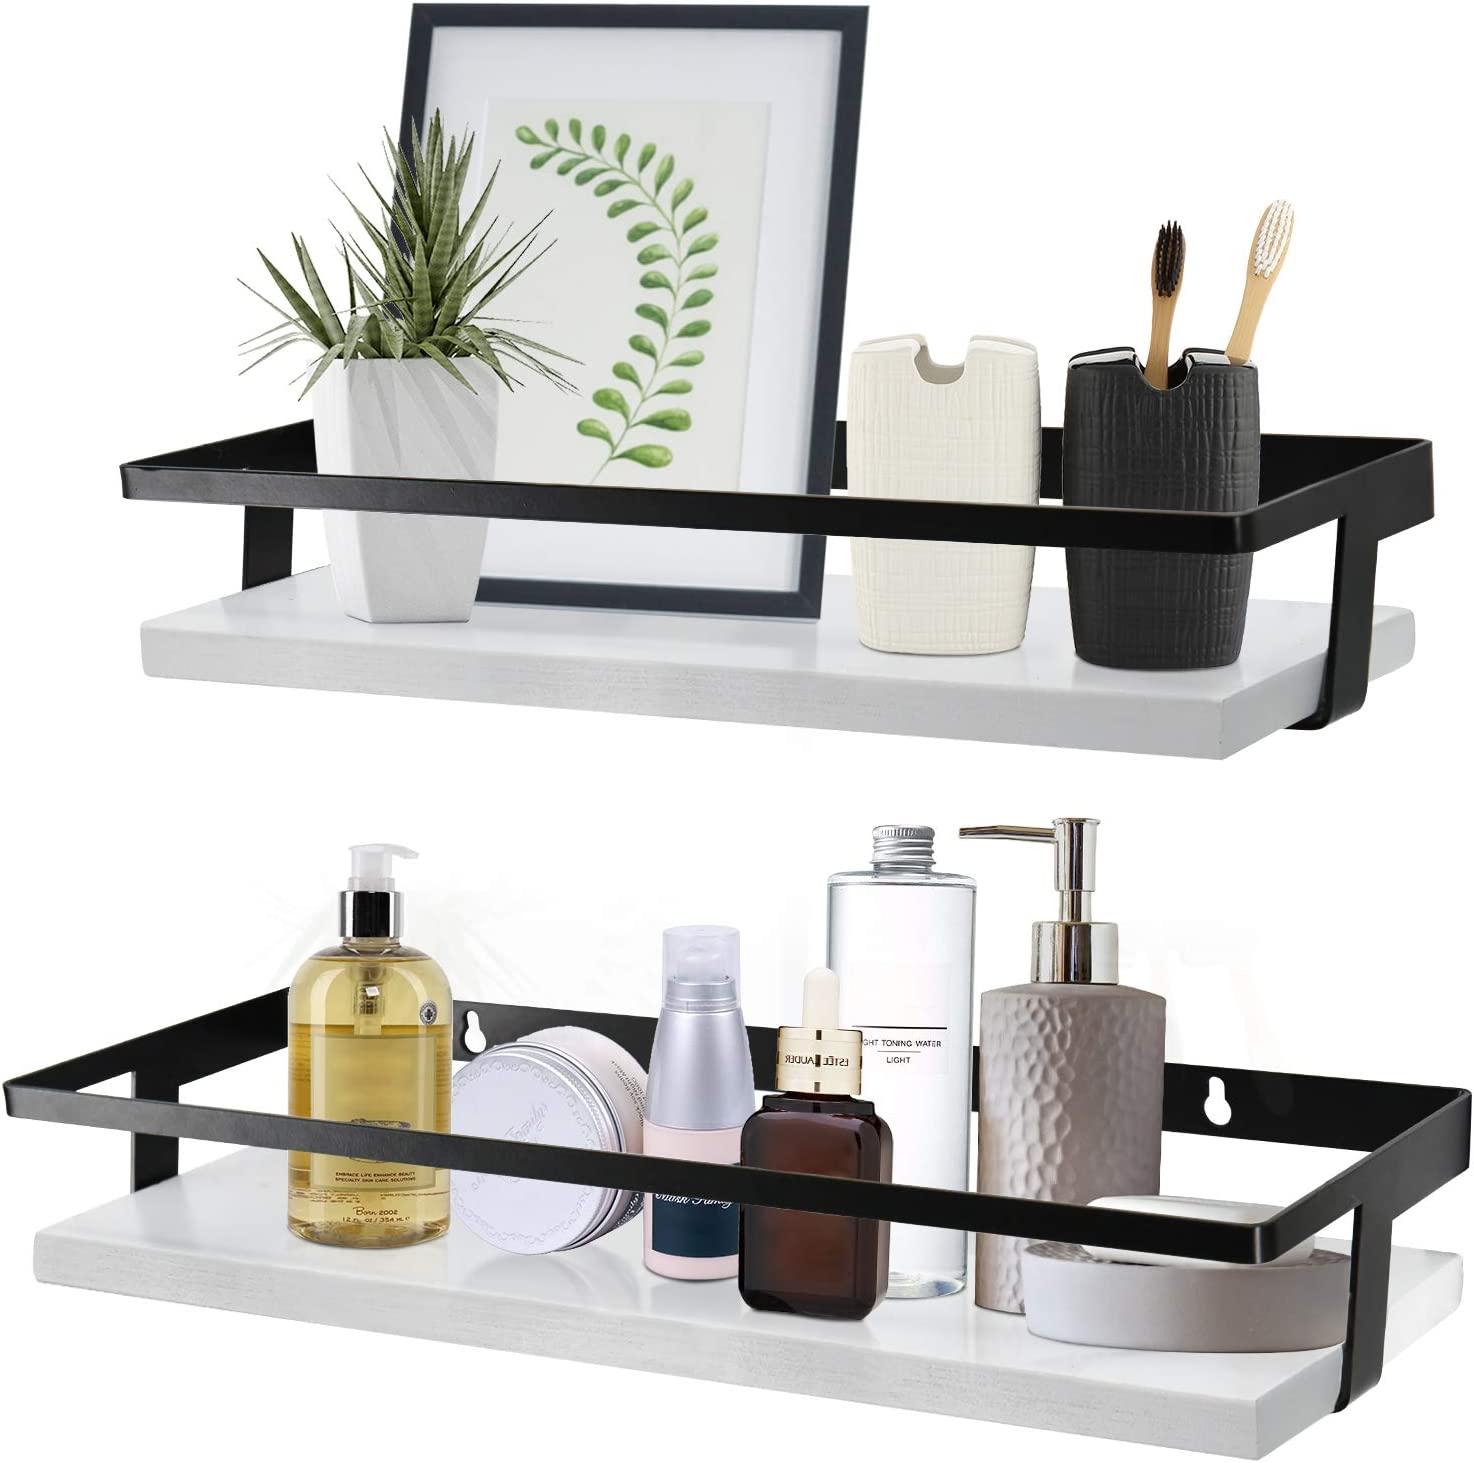 White Bathroom Floating Shelves Set, Decorative Glass Shelves Bathroom